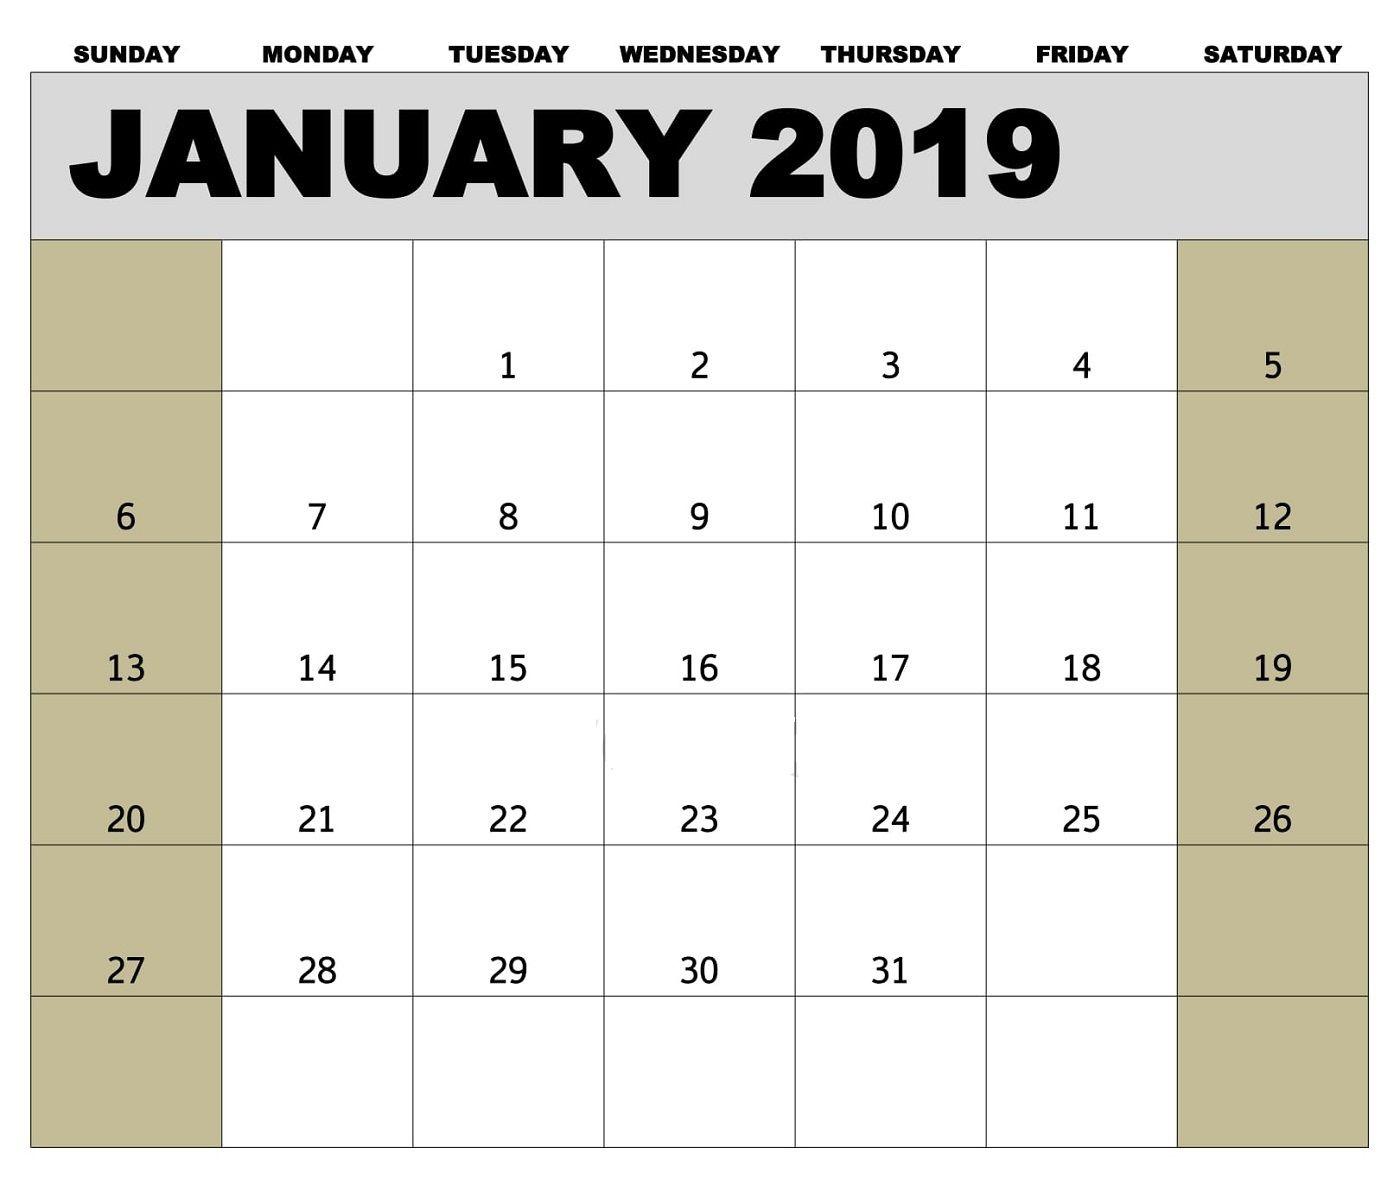 Editable January 2019 Calendar Template #januarycalendar inside Biweekly Payroll Schedule Template